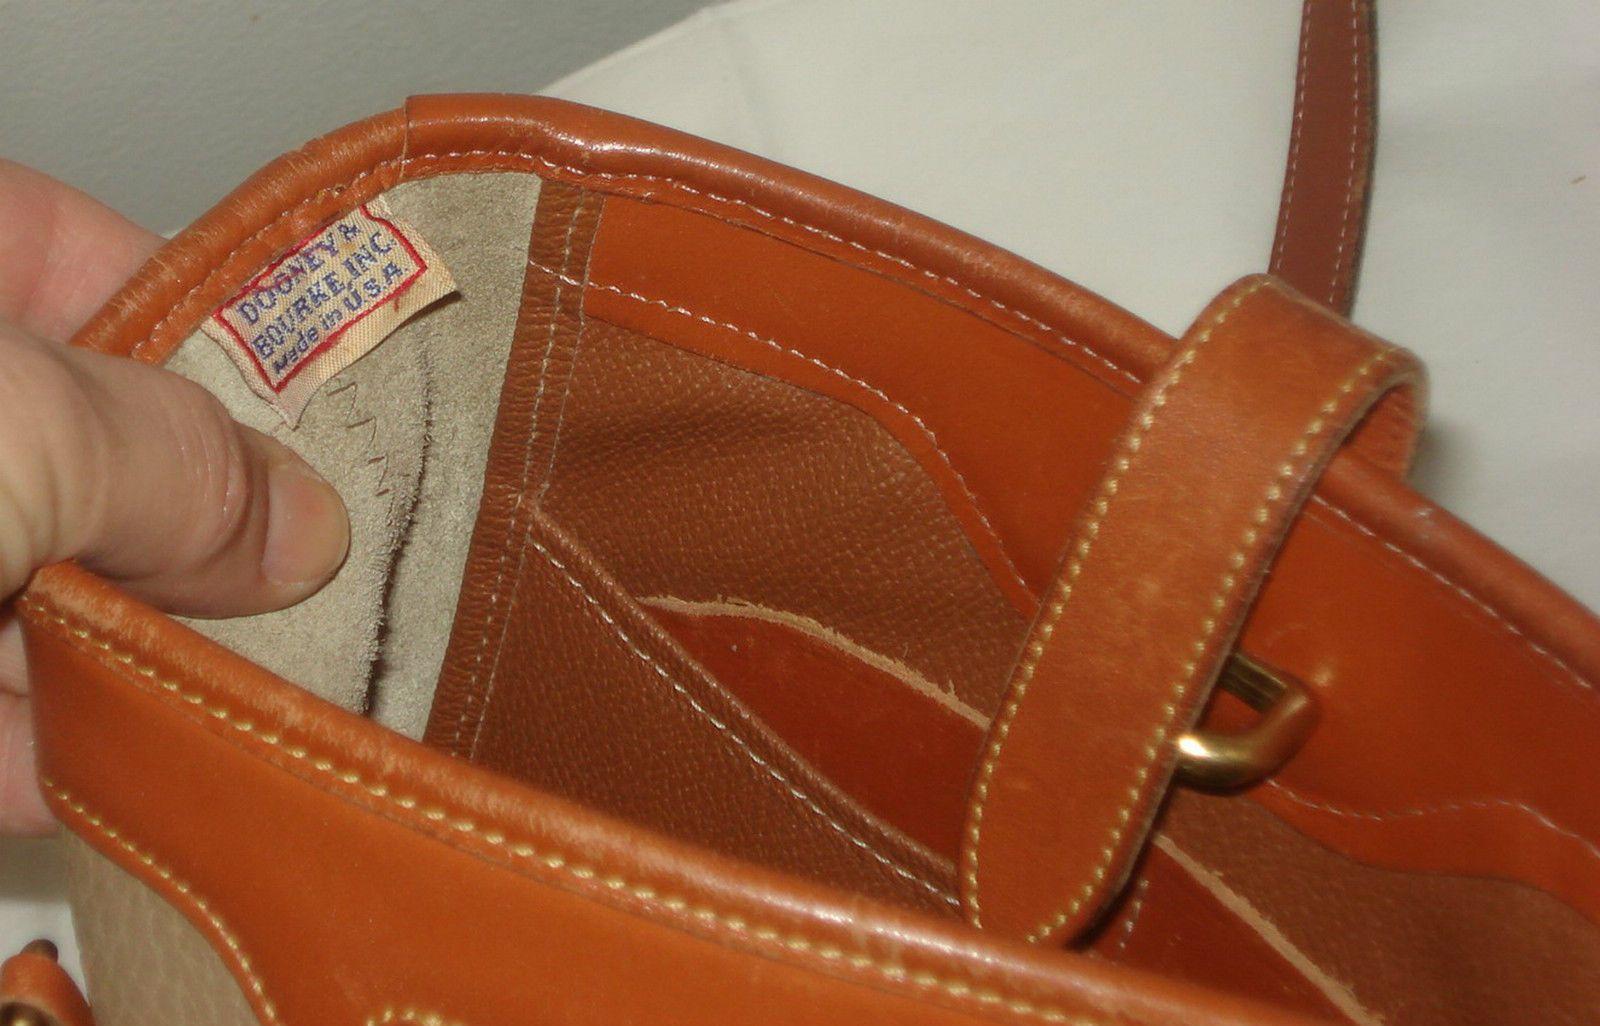 DOONEY & BOURKE Rare! xbody TAN Prince Leather Saddle